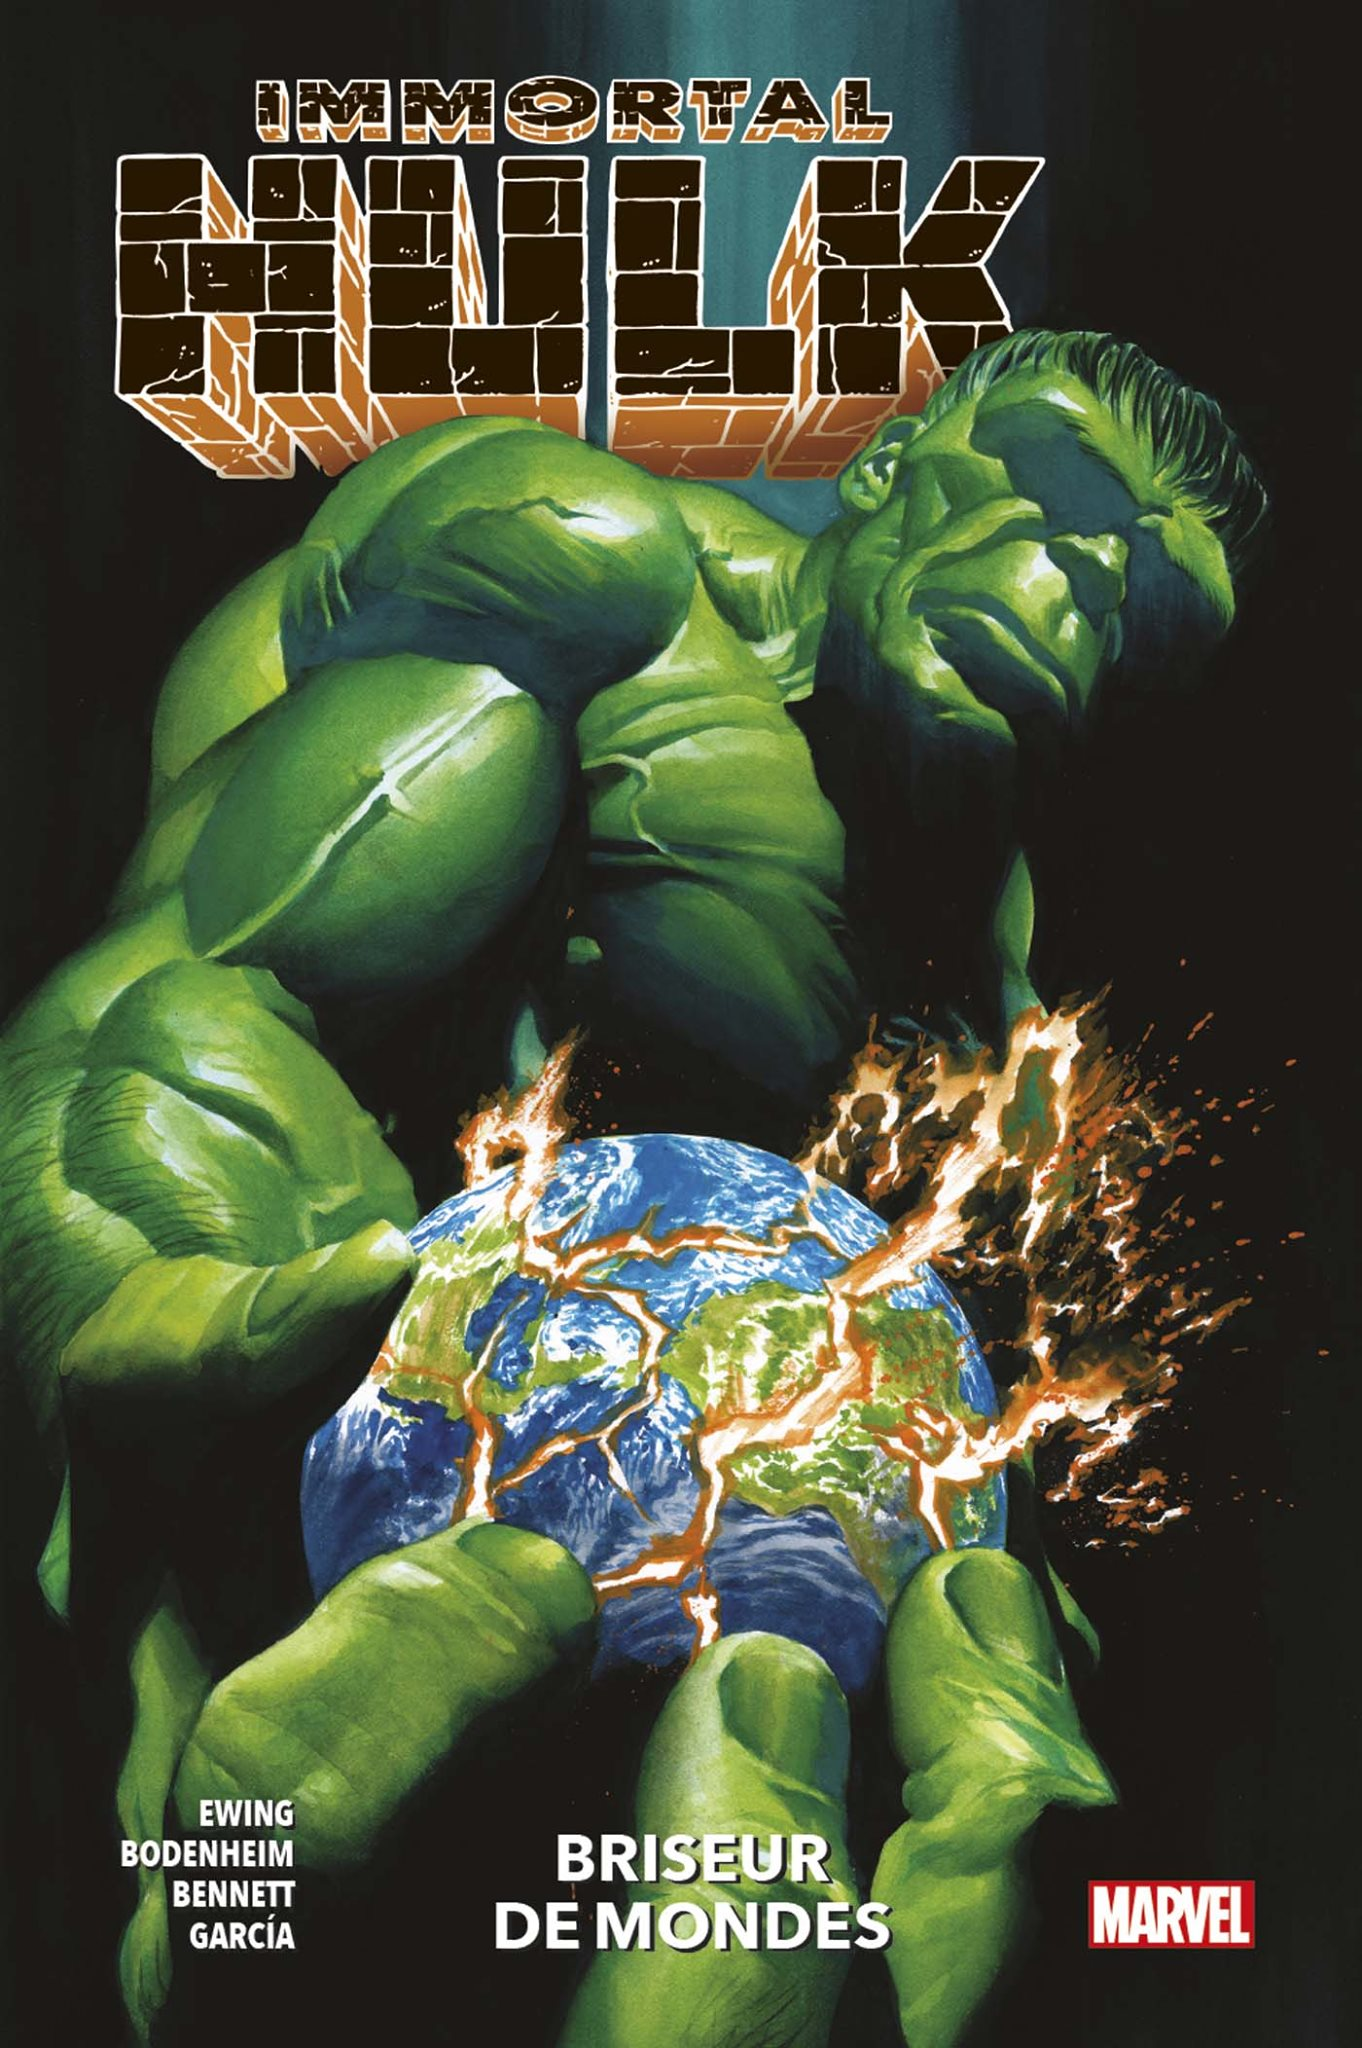 Immortal Hulk 5 - Briseur de Mondes